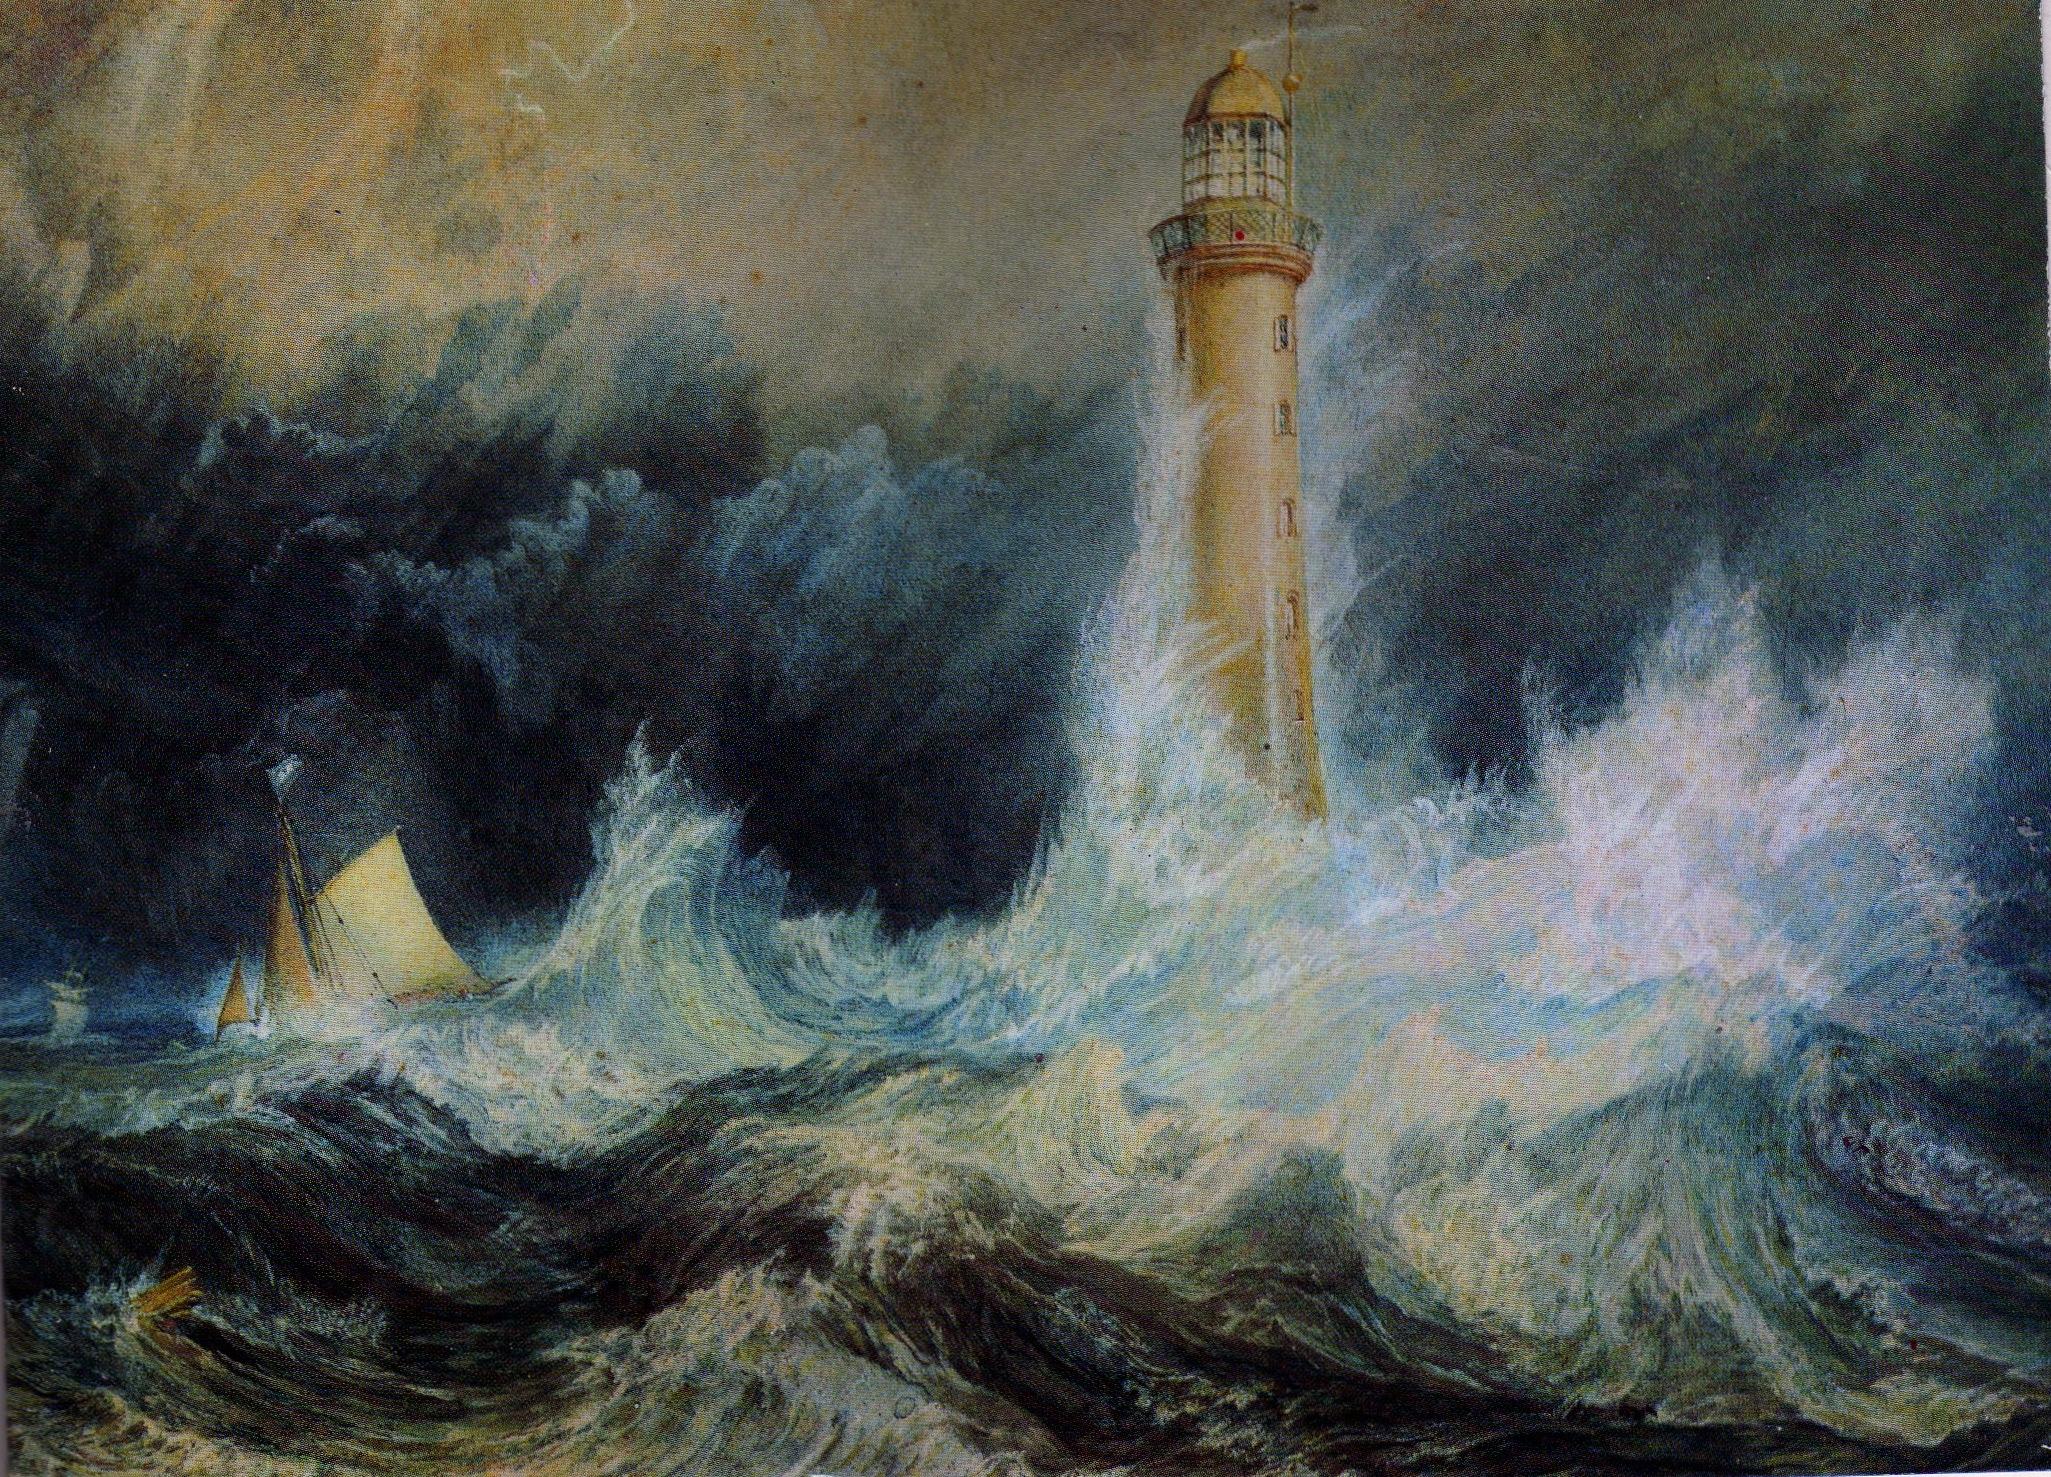 W Turner